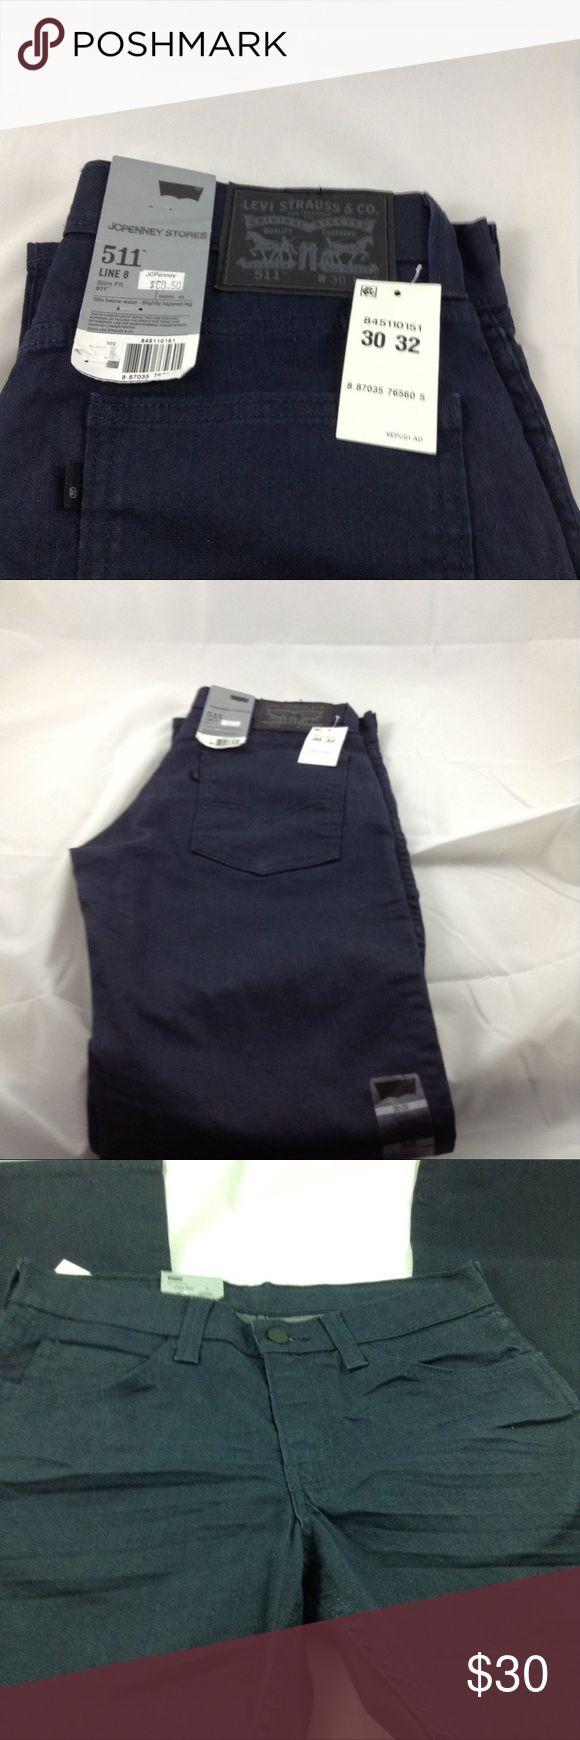 Levi Strauss & co jeans Levi's 511 waist 30,L32, NWT, sit slightly below waist, slightly tapered leg, slim fit Levi's Jeans Skinny